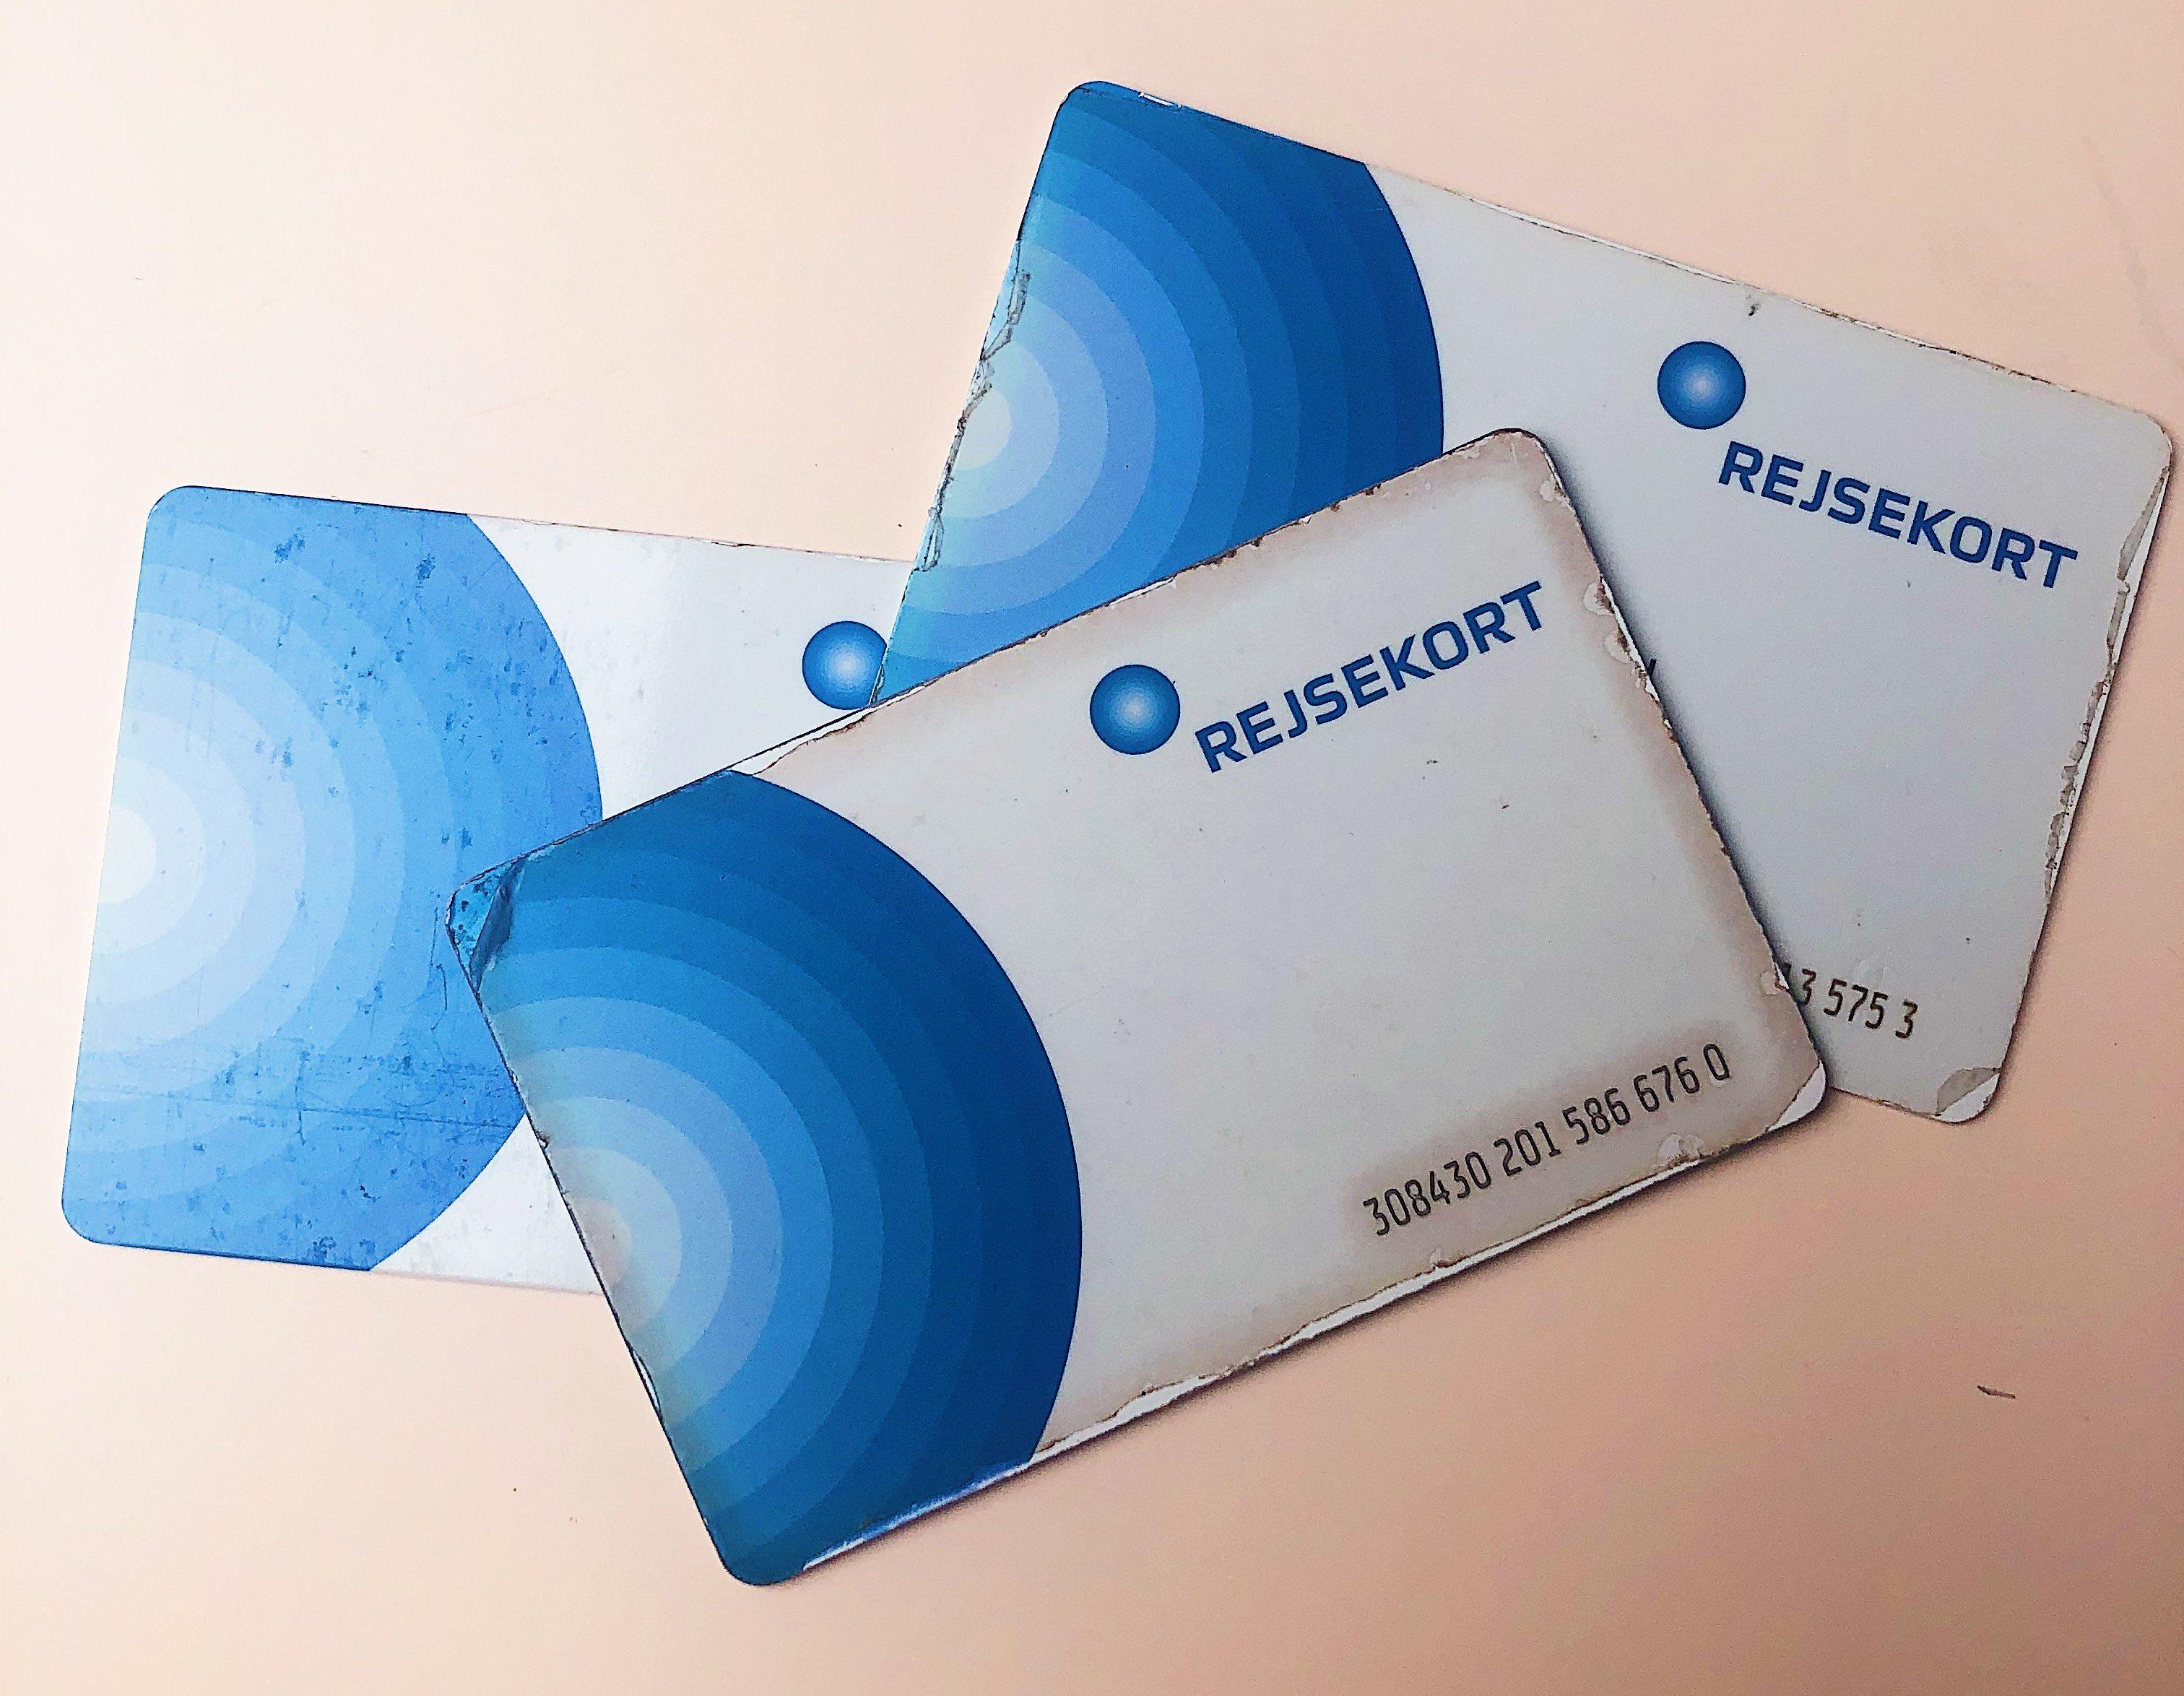 Rejsekort, kort, Anonymt Rejsekort. (Foto: MY DAILY SPACE)